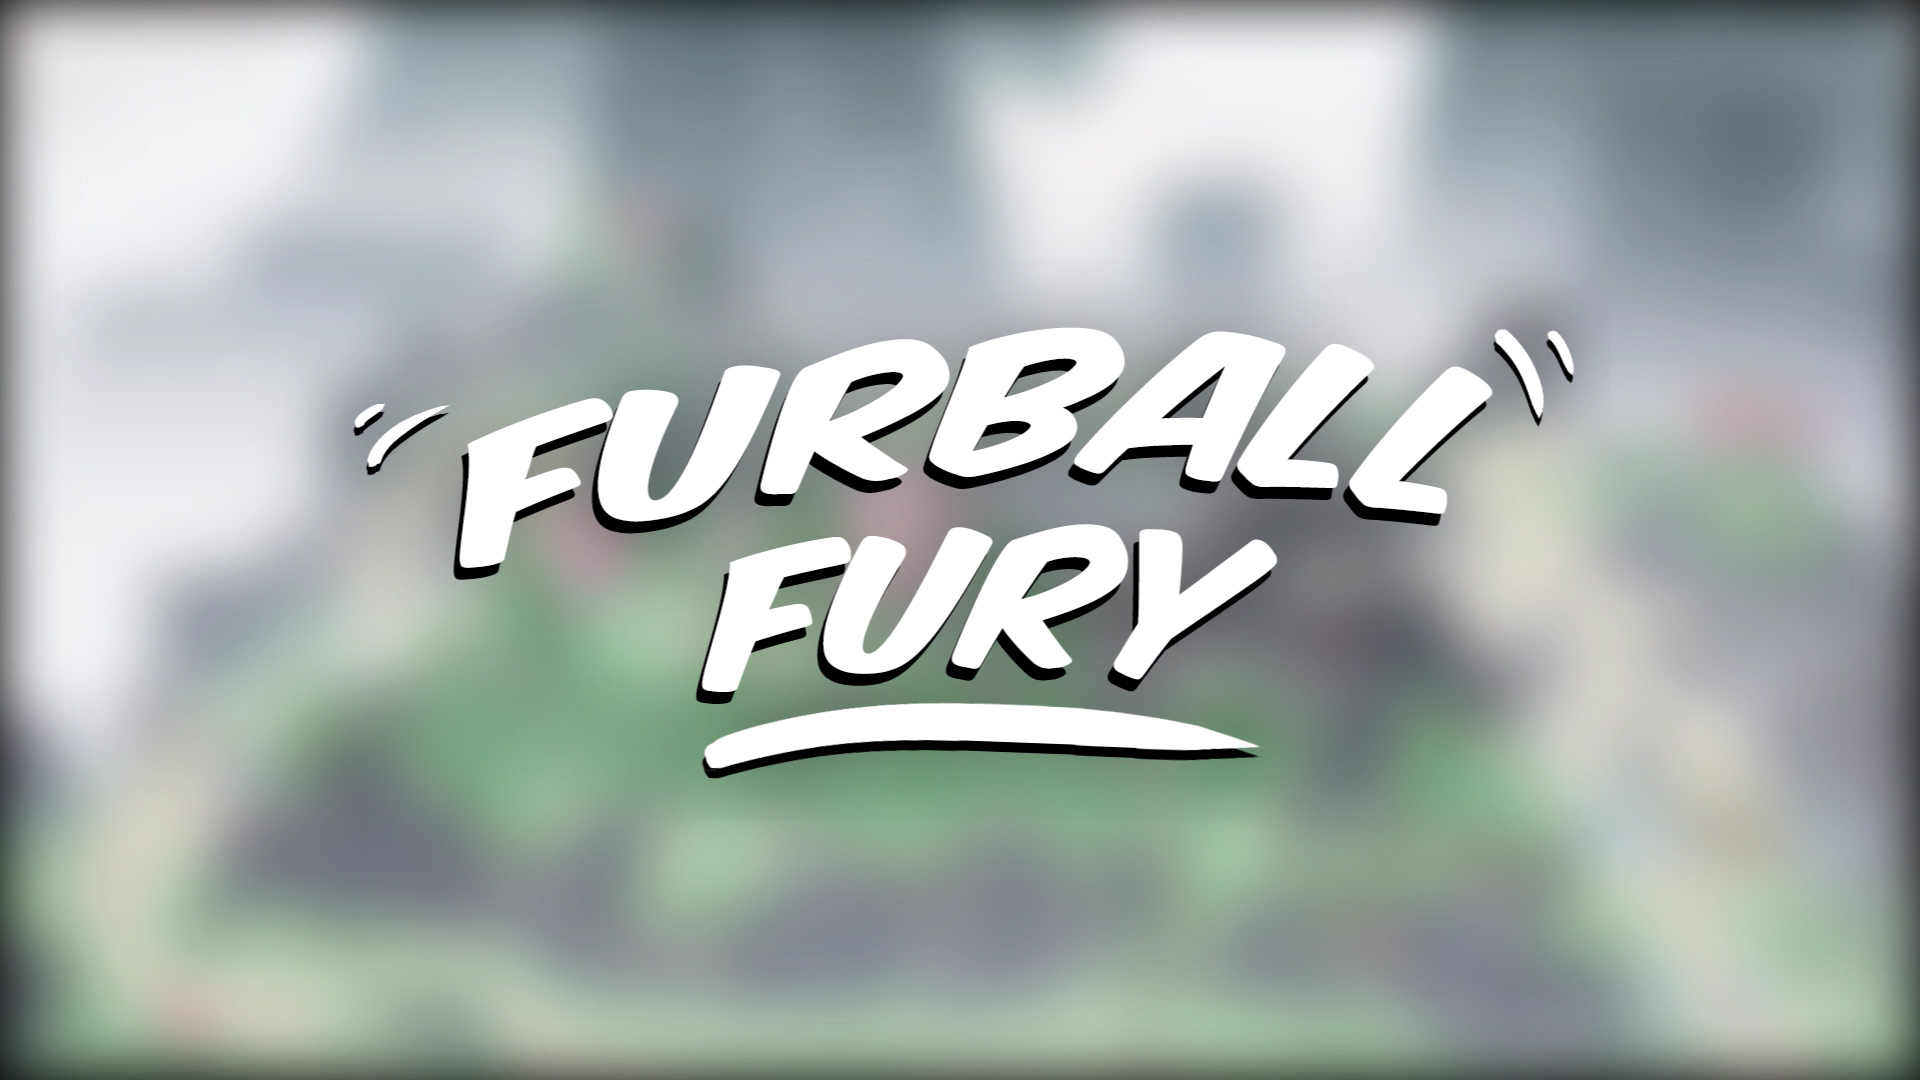 [Group17] Furball Fury